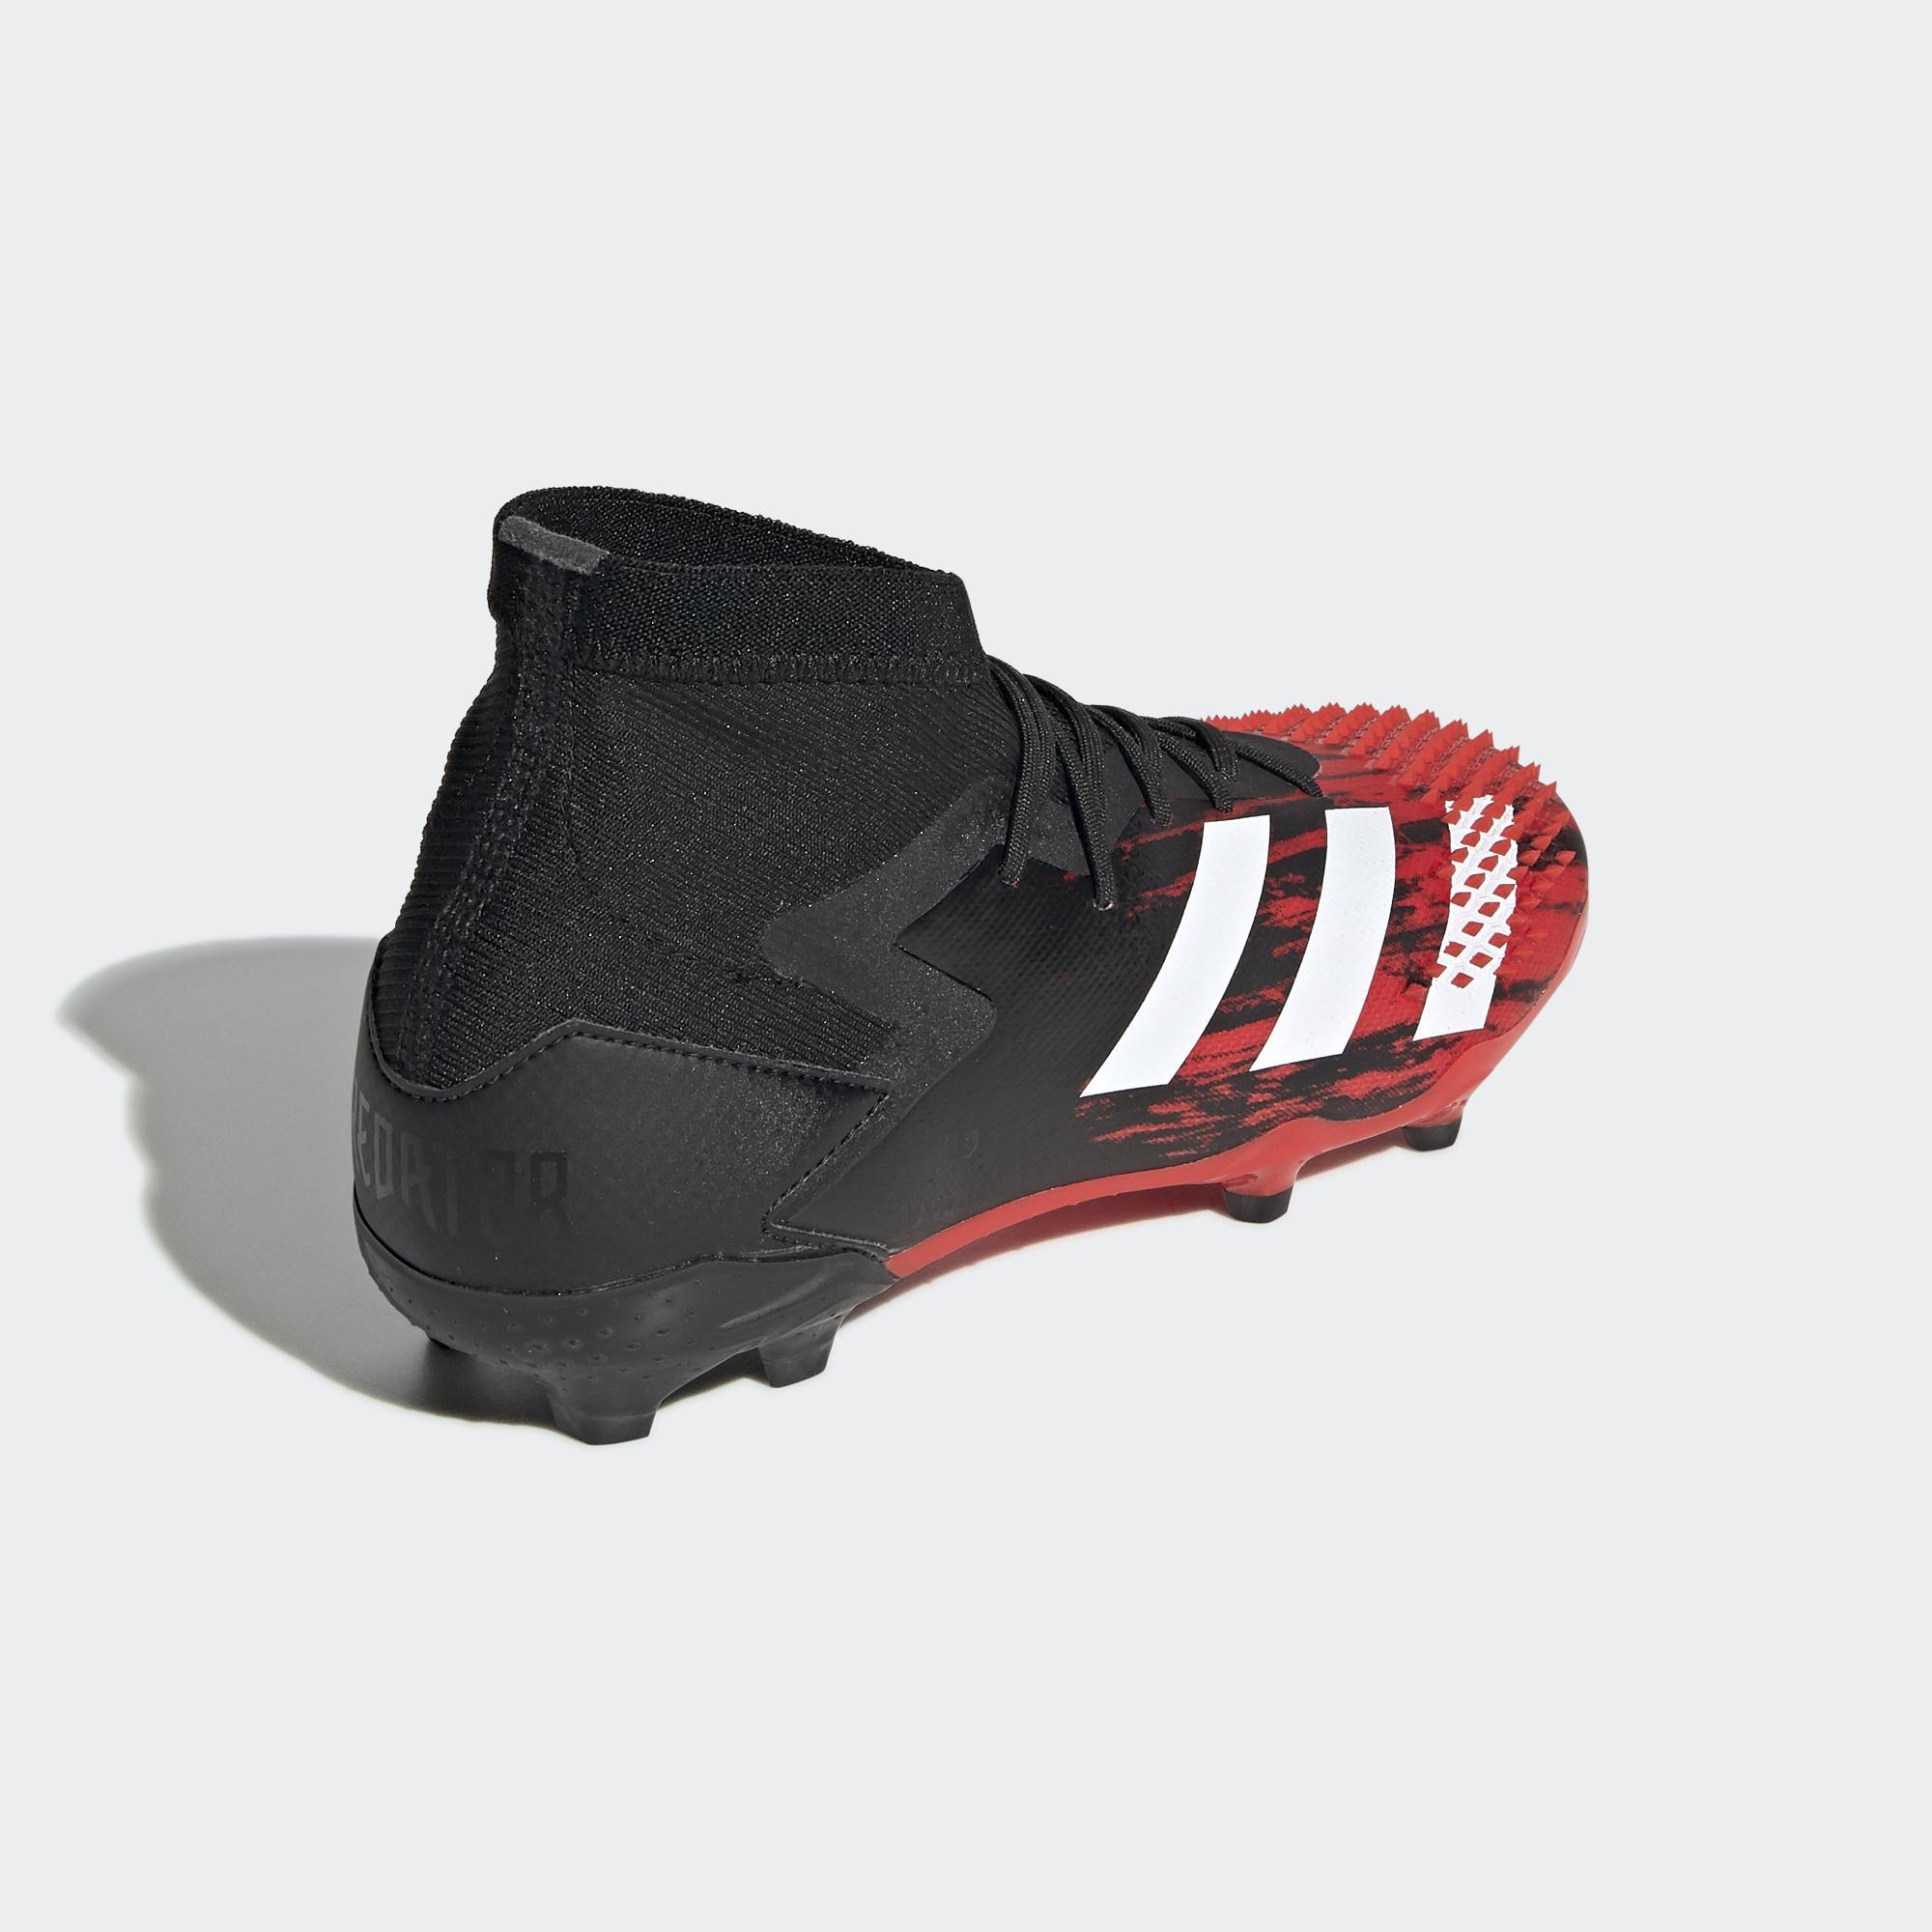 Adidas Predator TAN 19.3 Turf Boots Green adidas Singapore